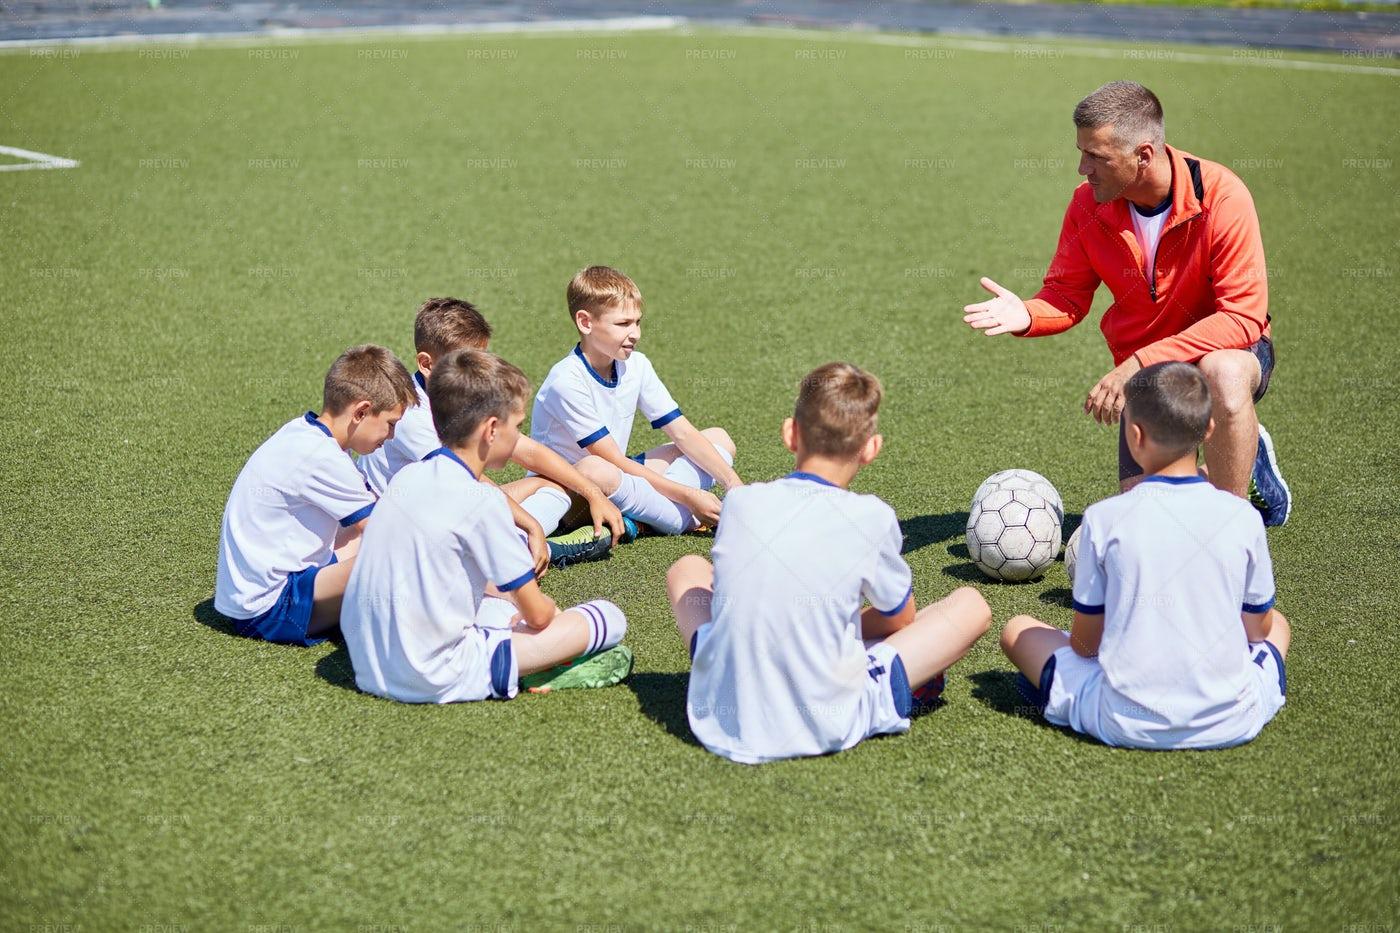 Coach Instructing  Football Team In...: Stock Photos